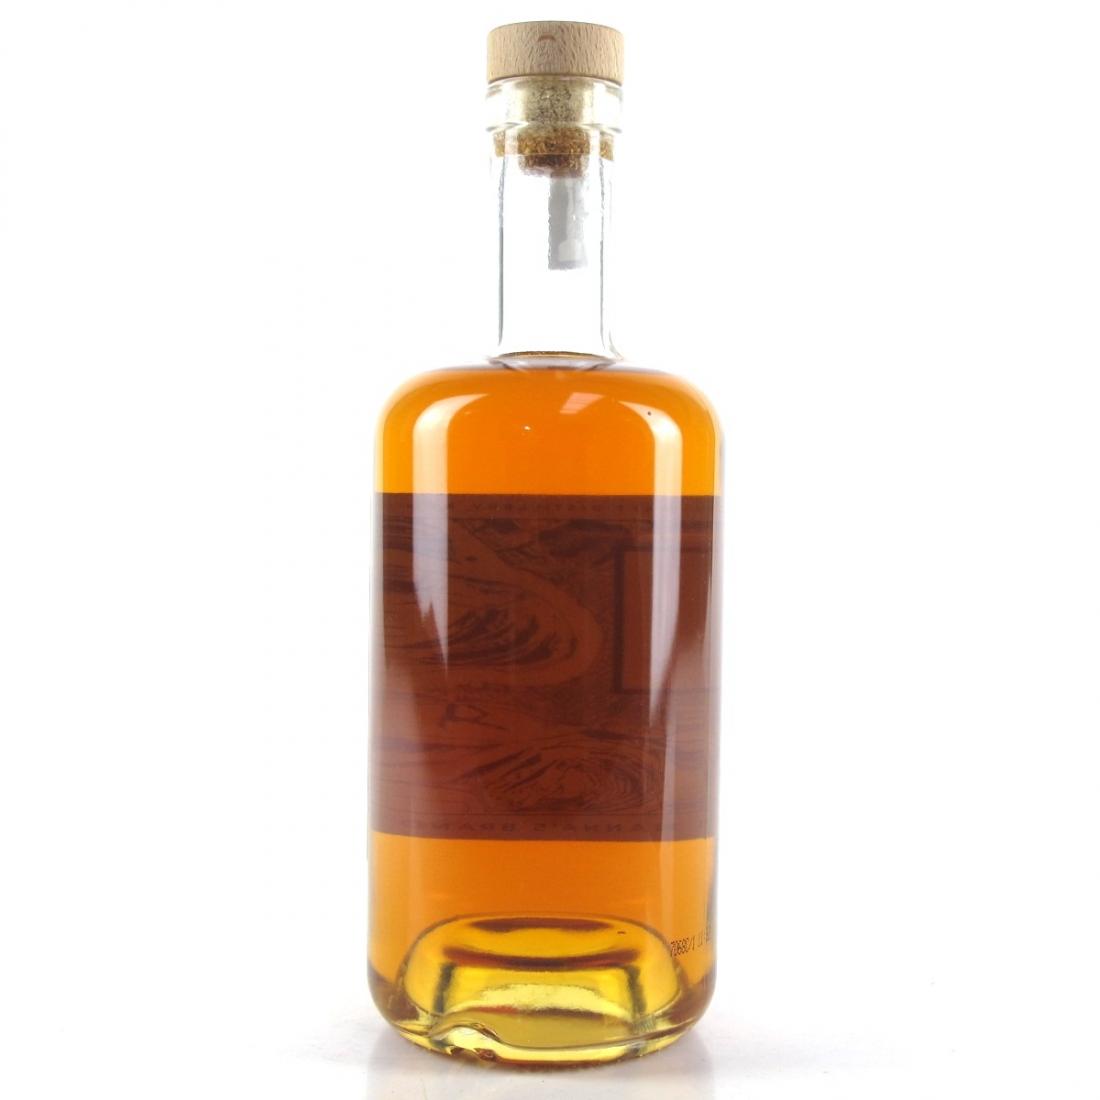 Twenty Third St Not Your Nanna's Australian Brandy